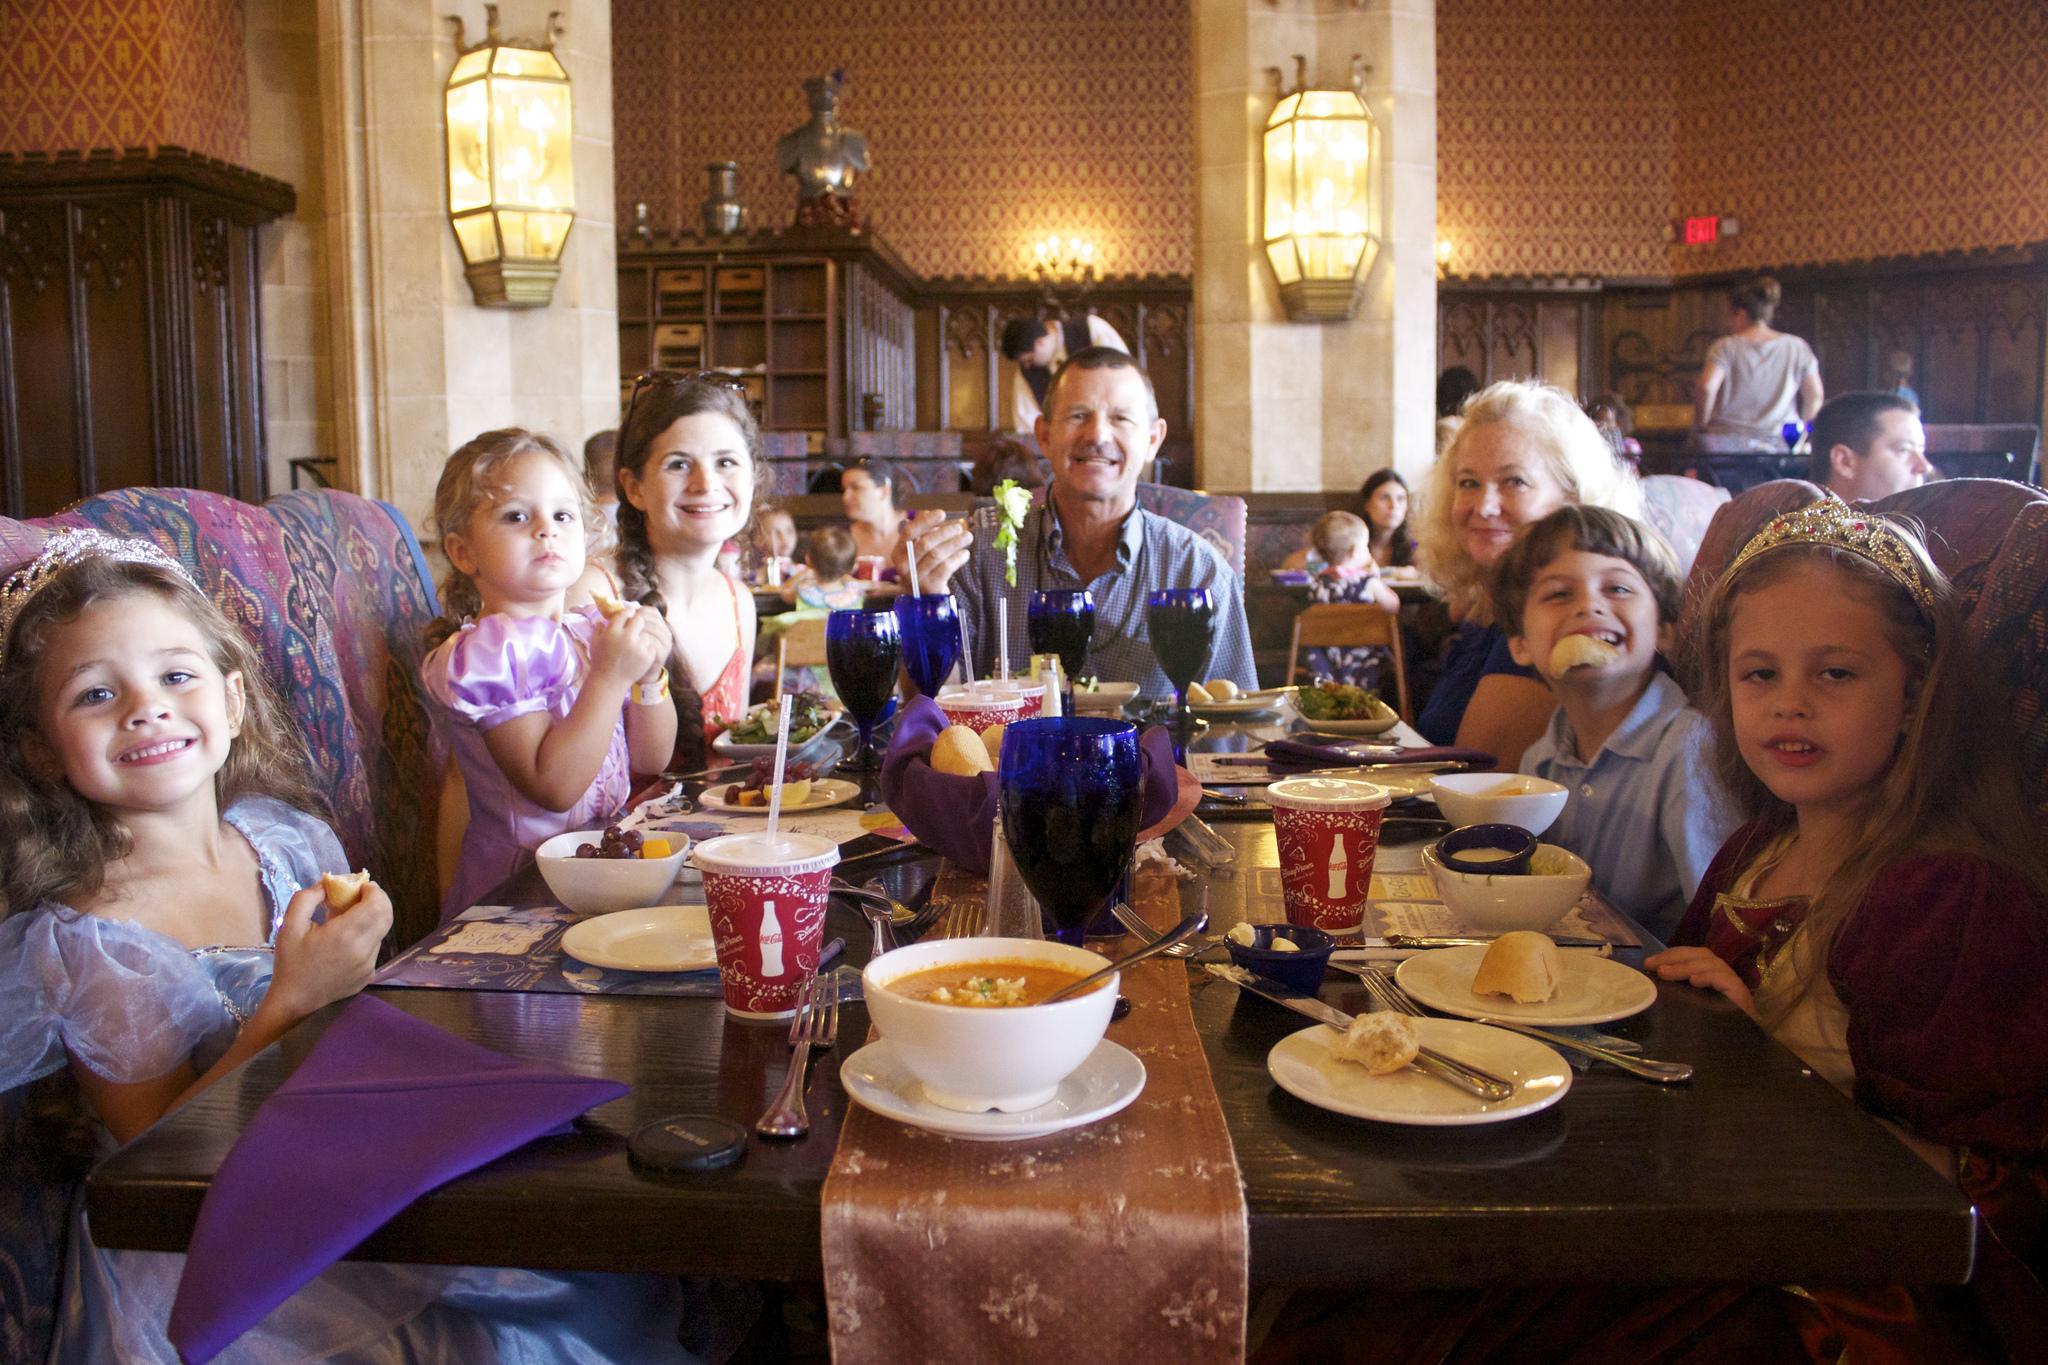 Cinderella's Royal Table character dining